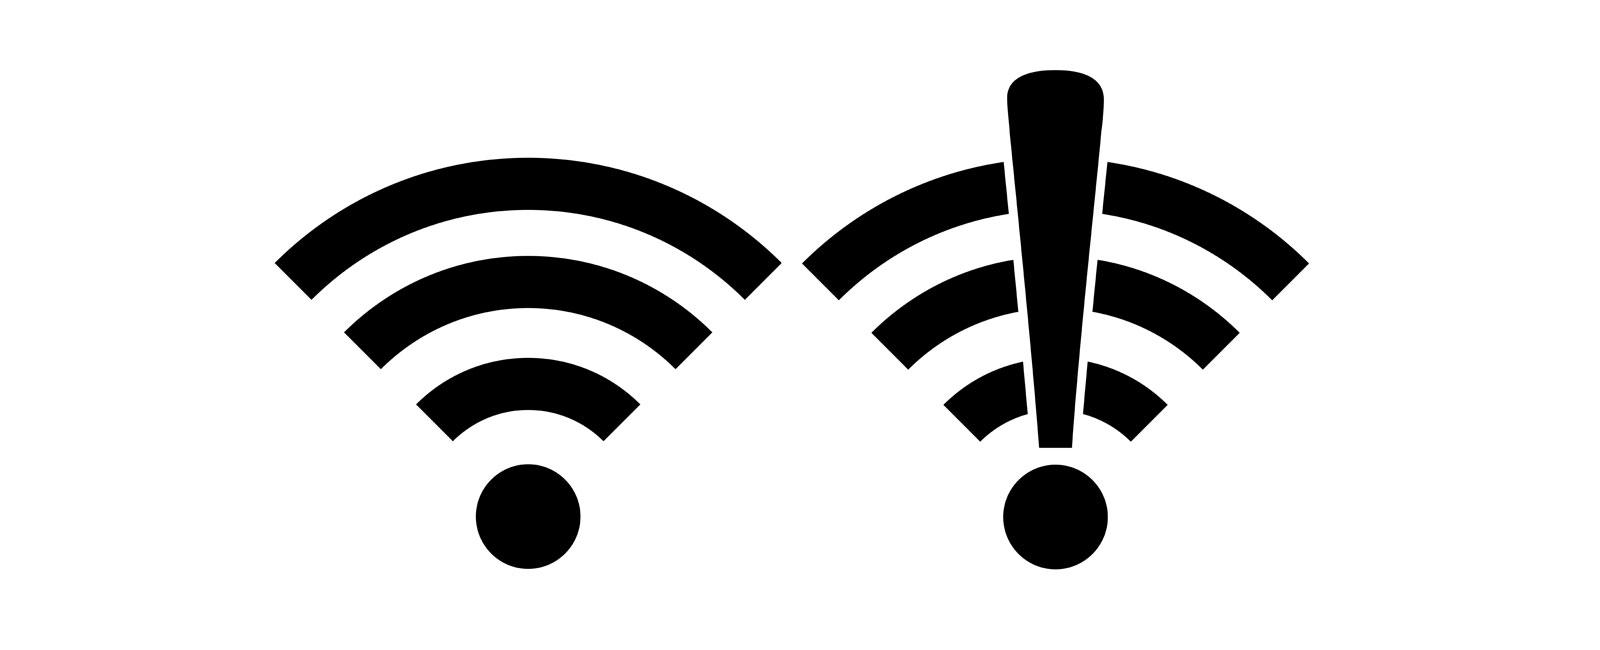 Avoiding-Network-Downtime-in-Smart-Buildings